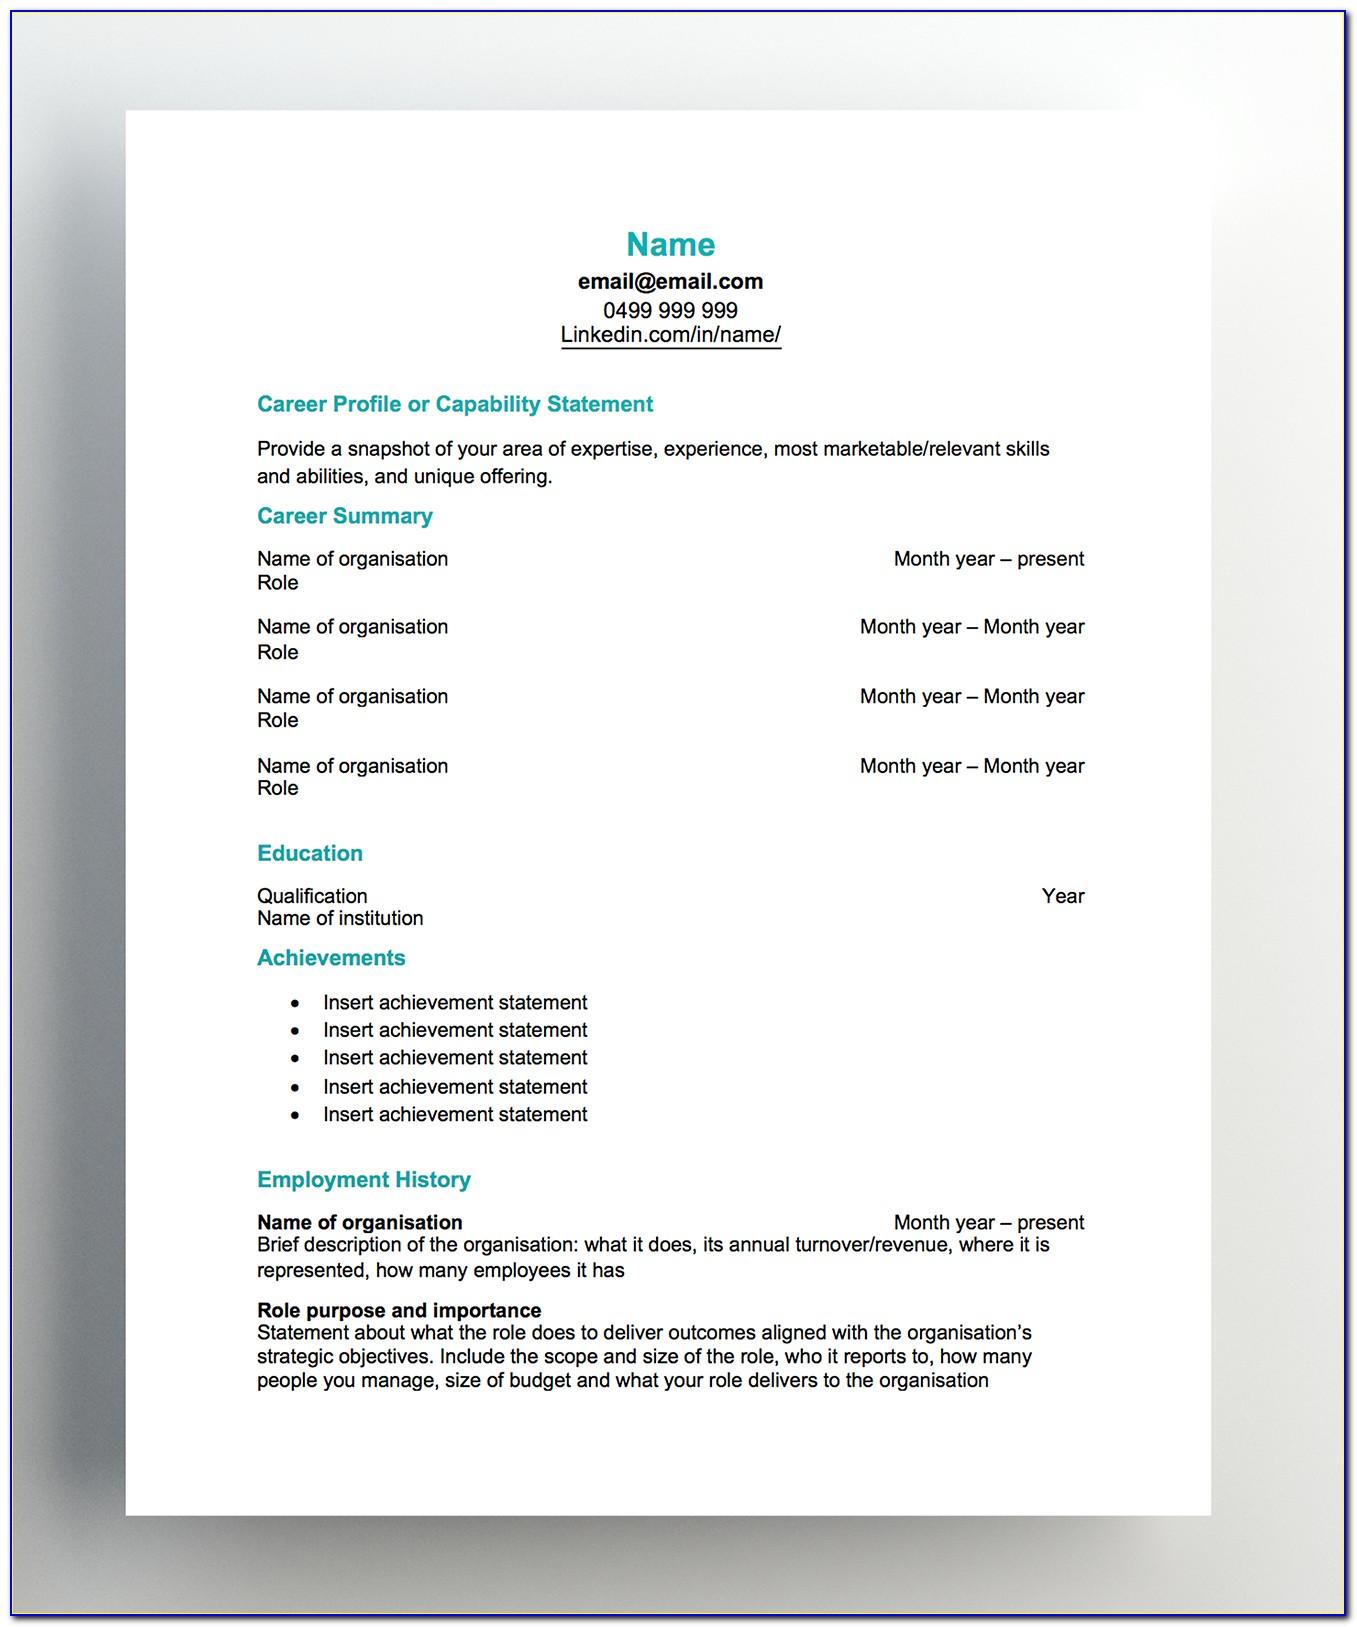 Free Resume Template Australia 2018